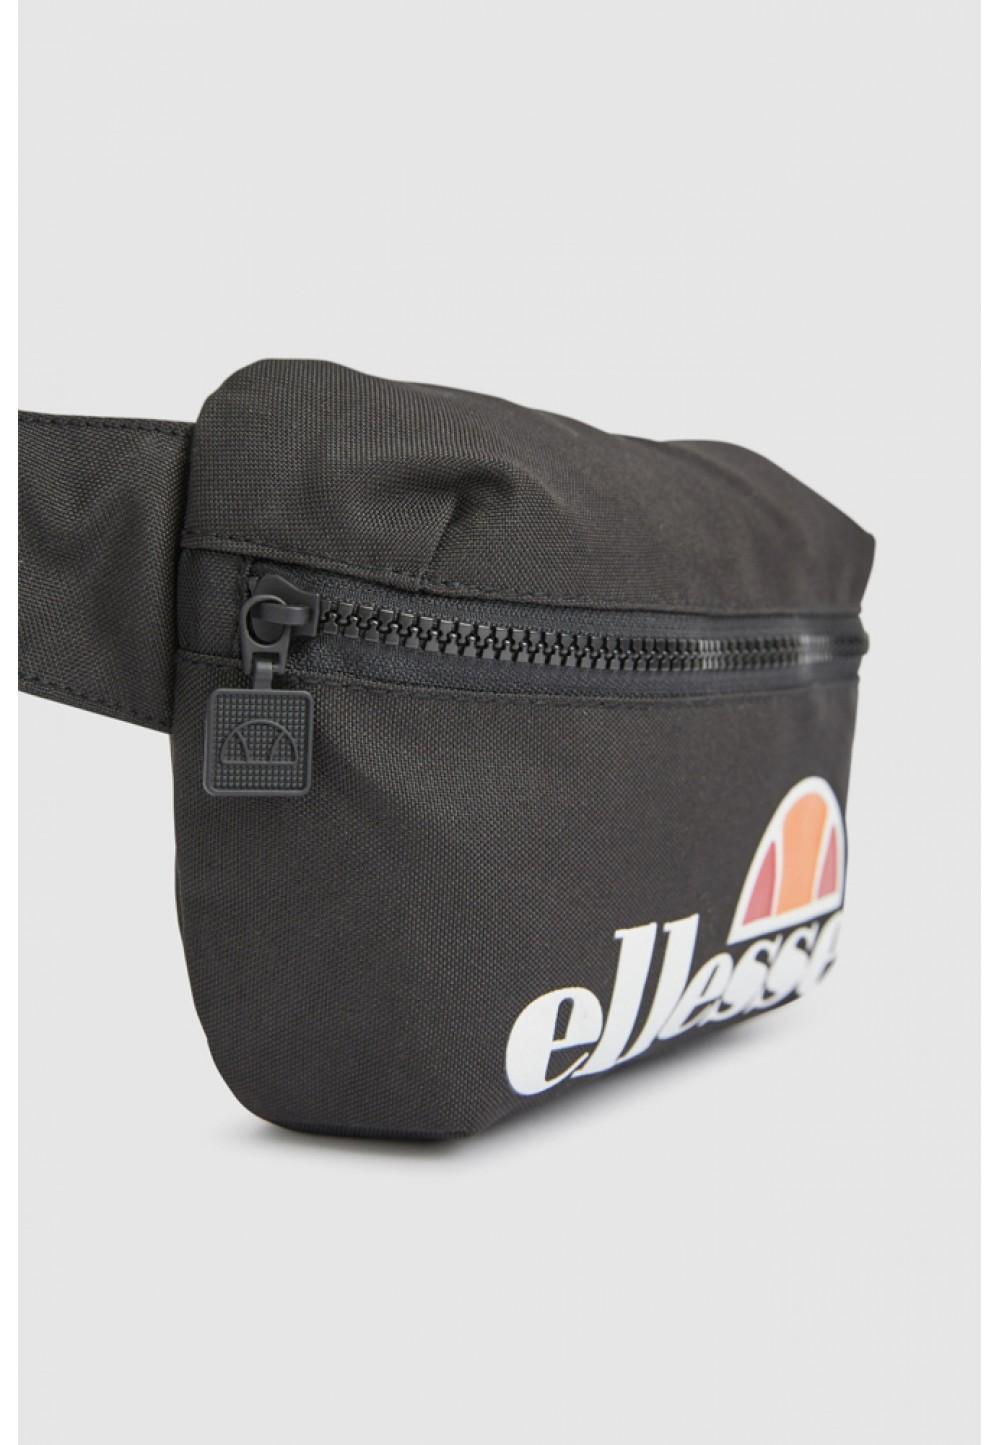 Черная сумка на пояс с логотипом